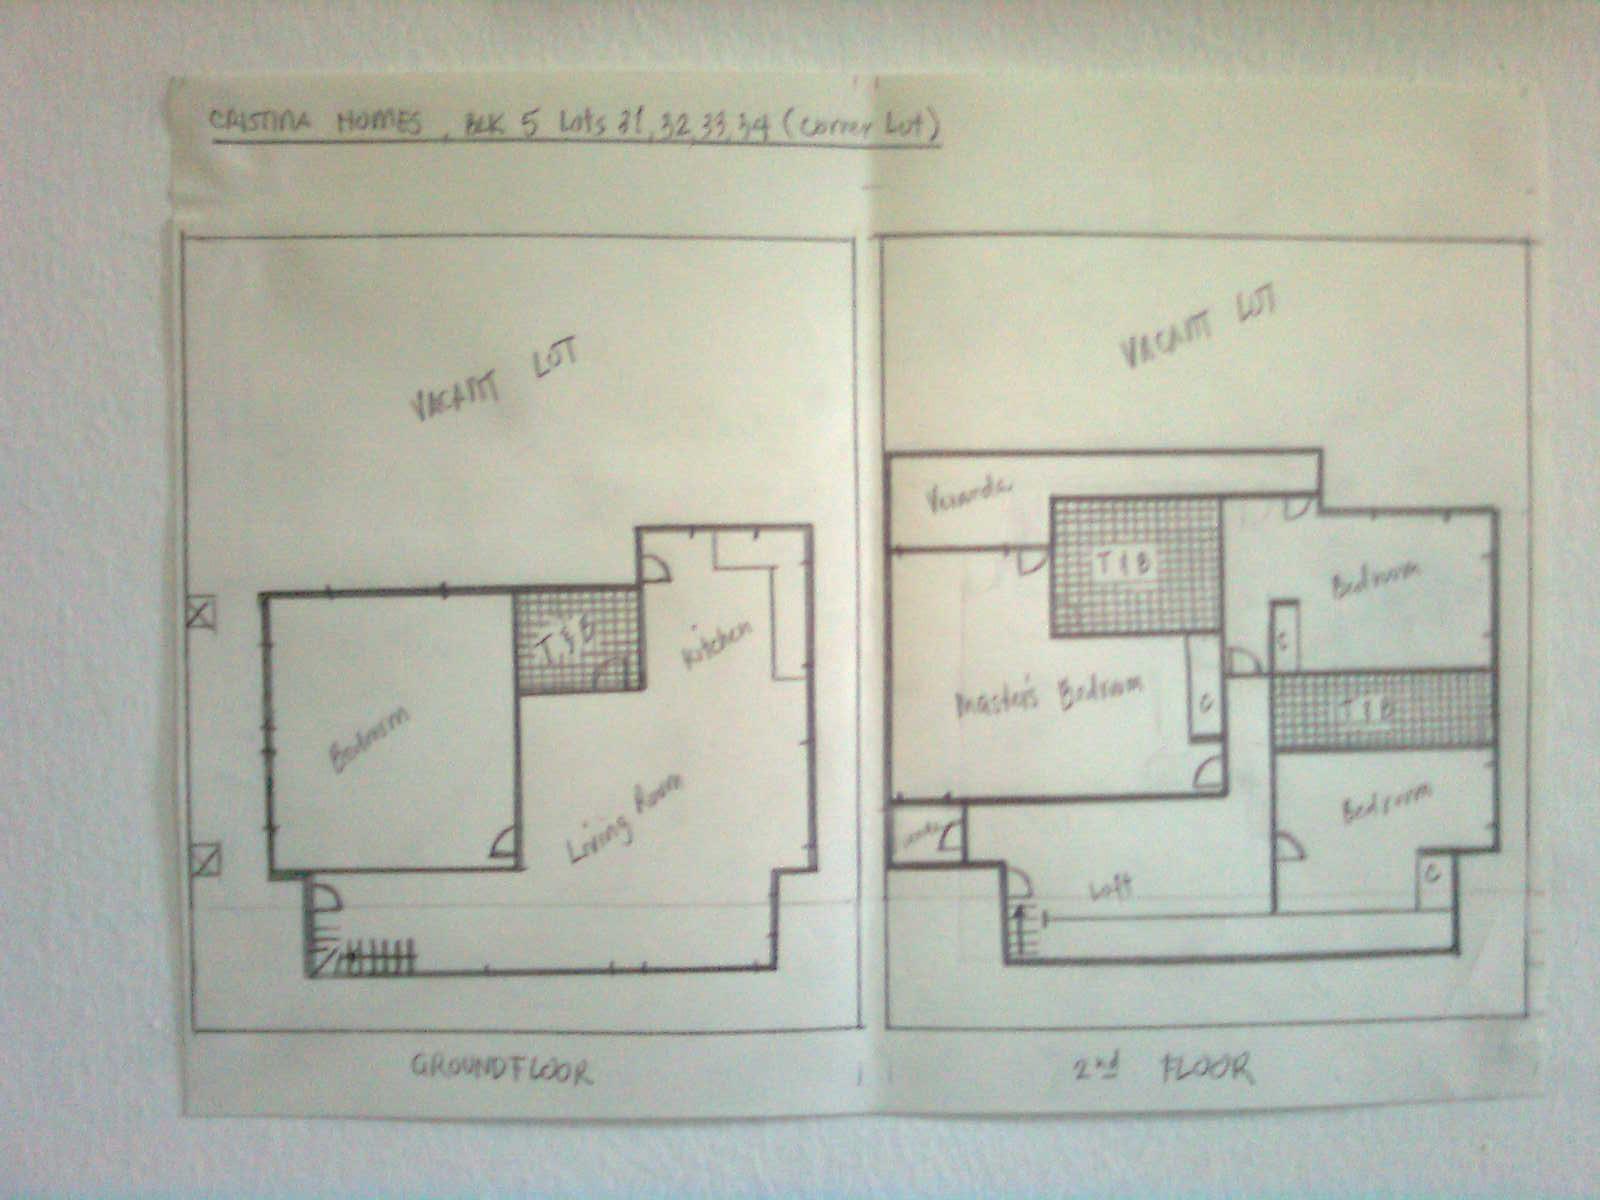 floor plan (ground & 2nd floors)